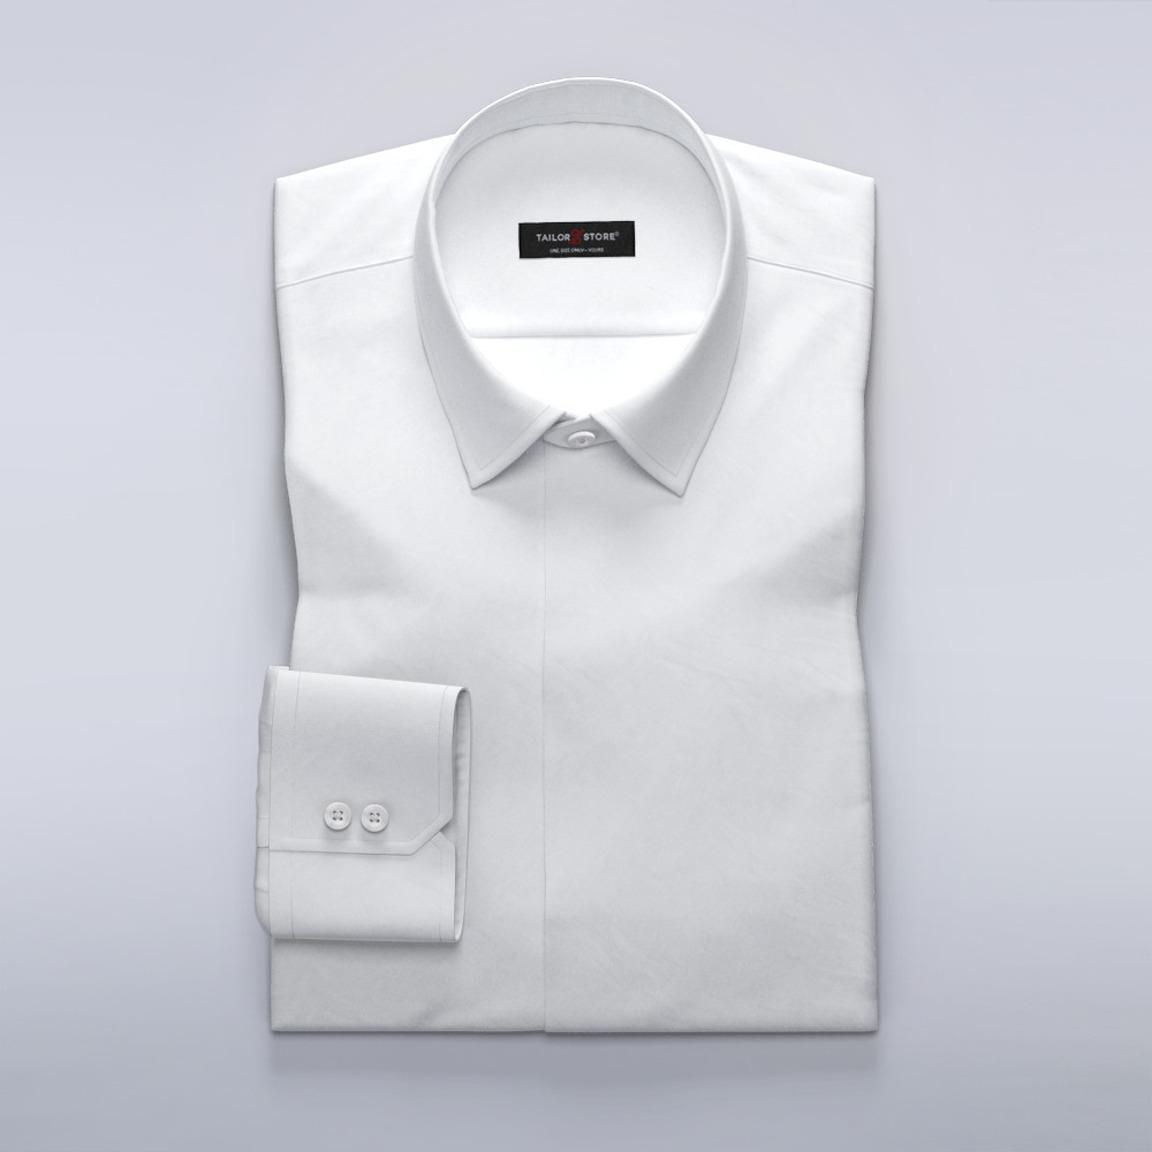 Damskjorta i vit stretchtwill